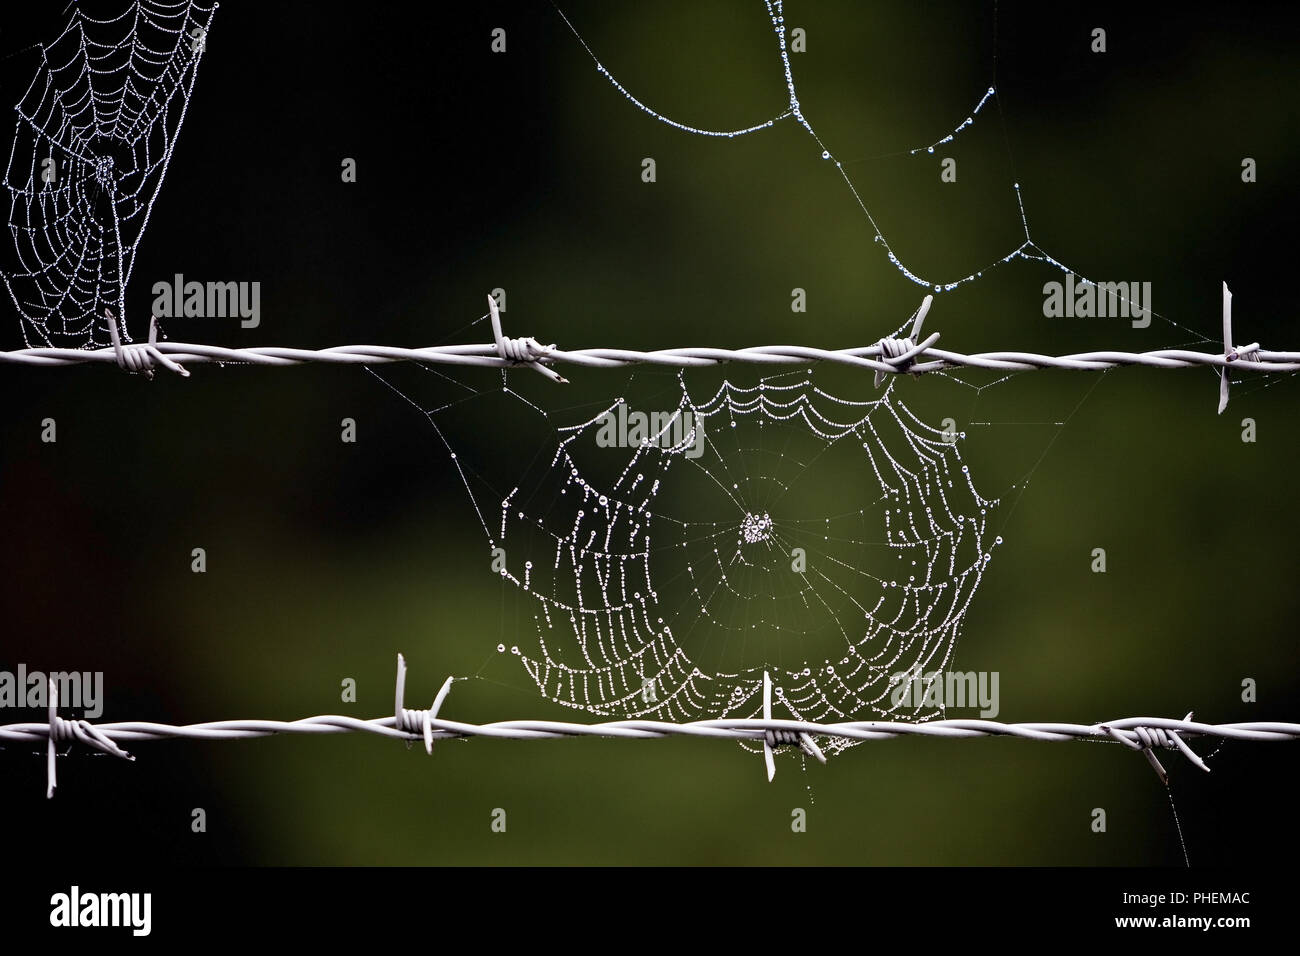 Barbelés et Spider web, Bruehl, Nordrhein-Westfalen, Germany, Europe Photo Stock